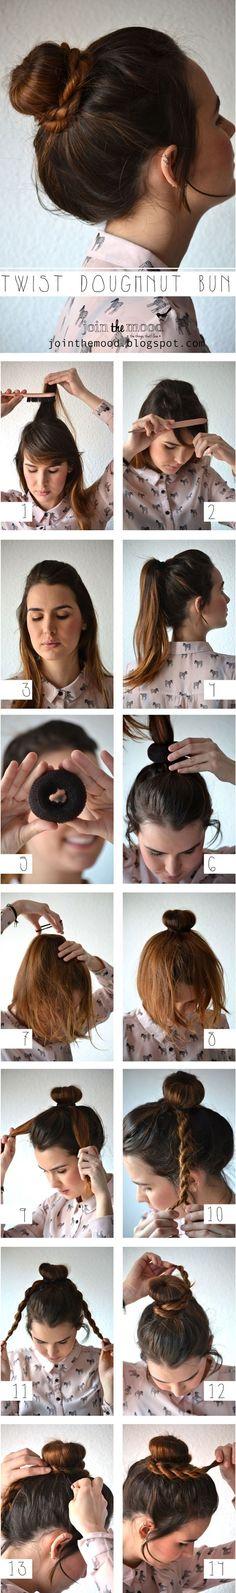 How To Make Twist Doughnut Bun For Your Hair